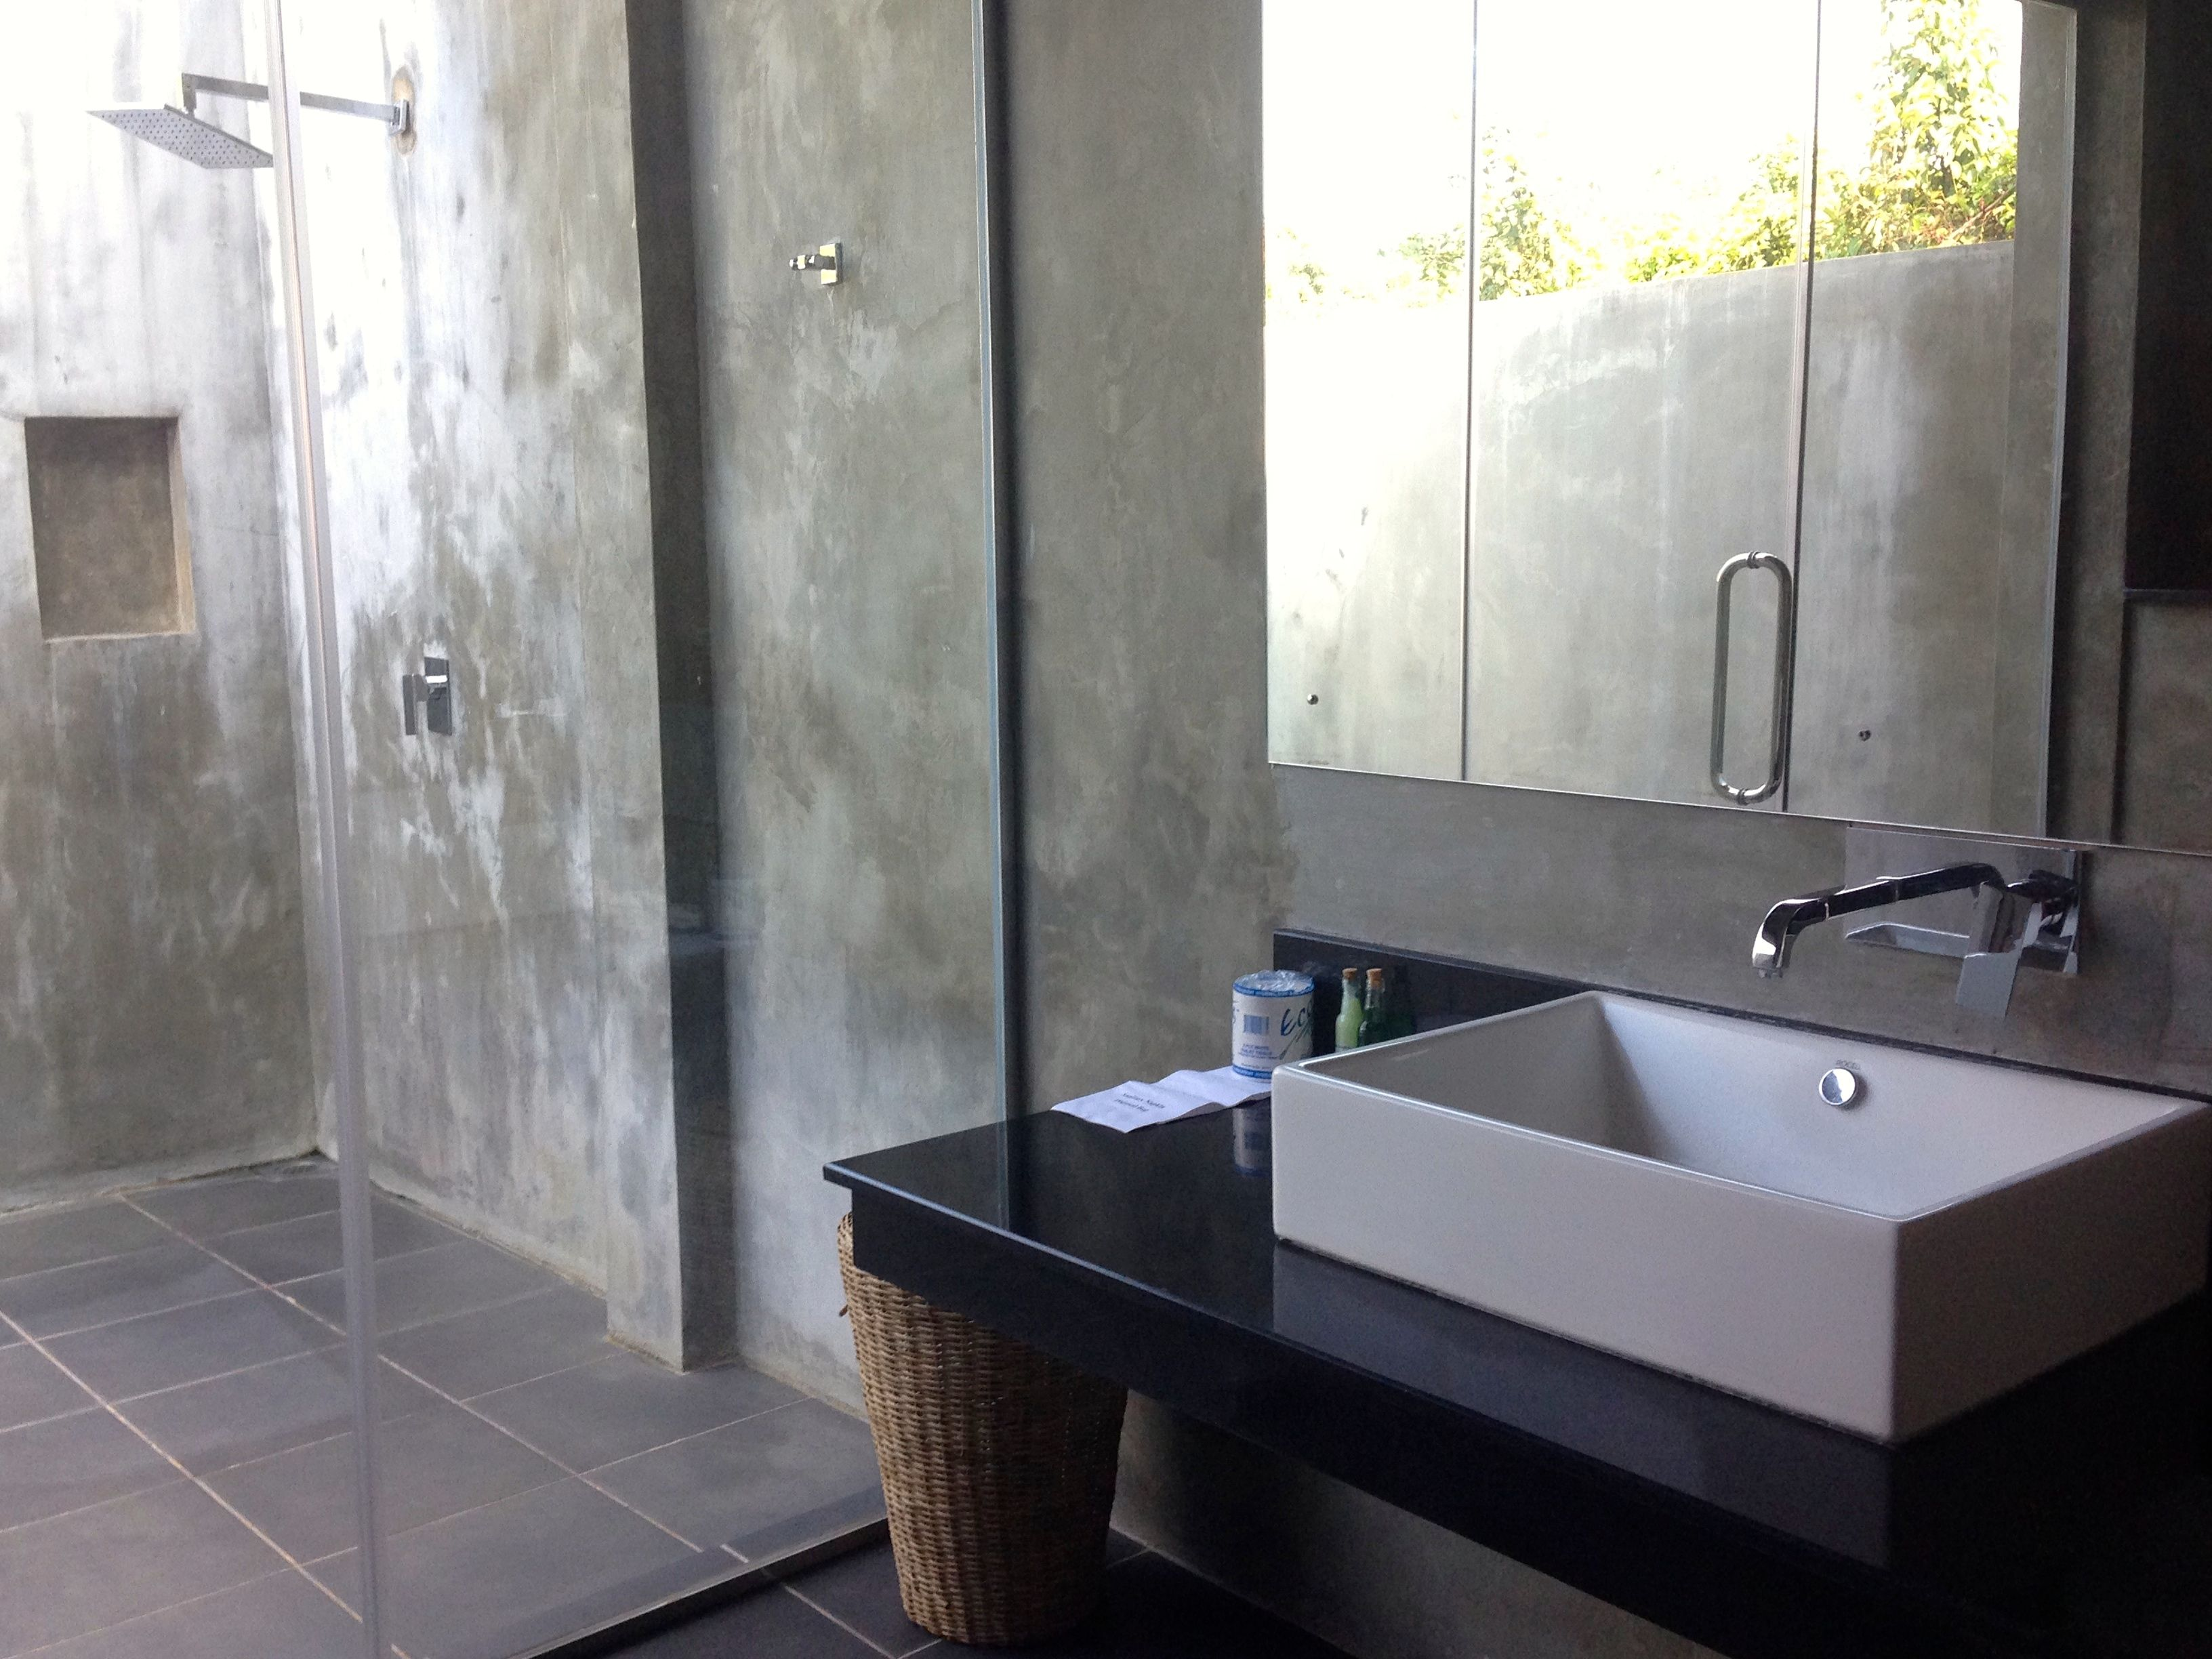 Glass House House House On A Hill Home bathroom design sri lanka